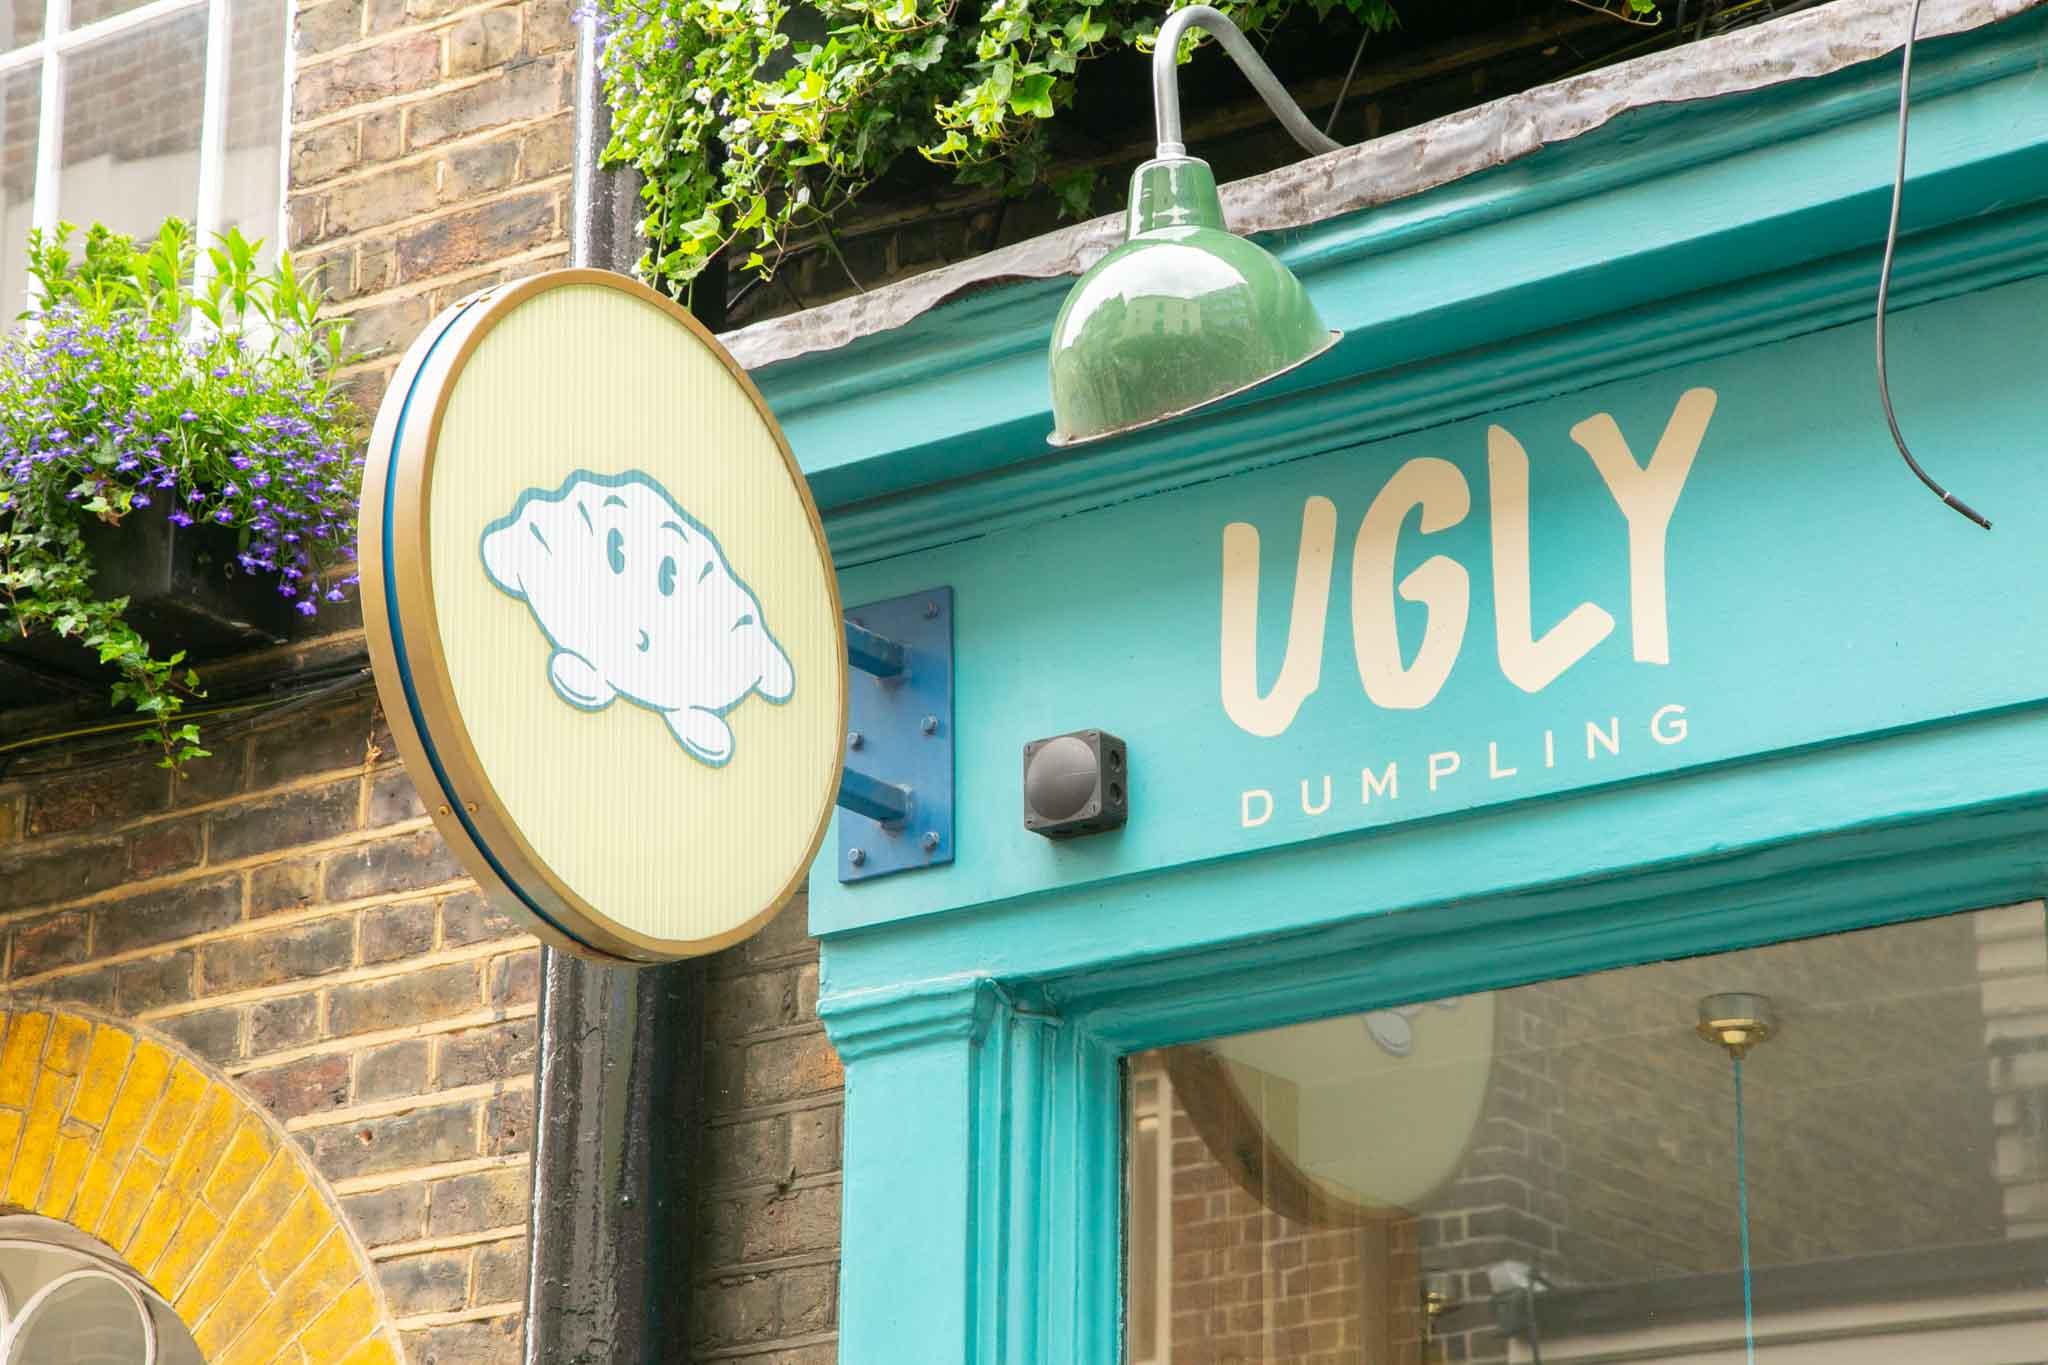 ugly dumpling soho brand identity